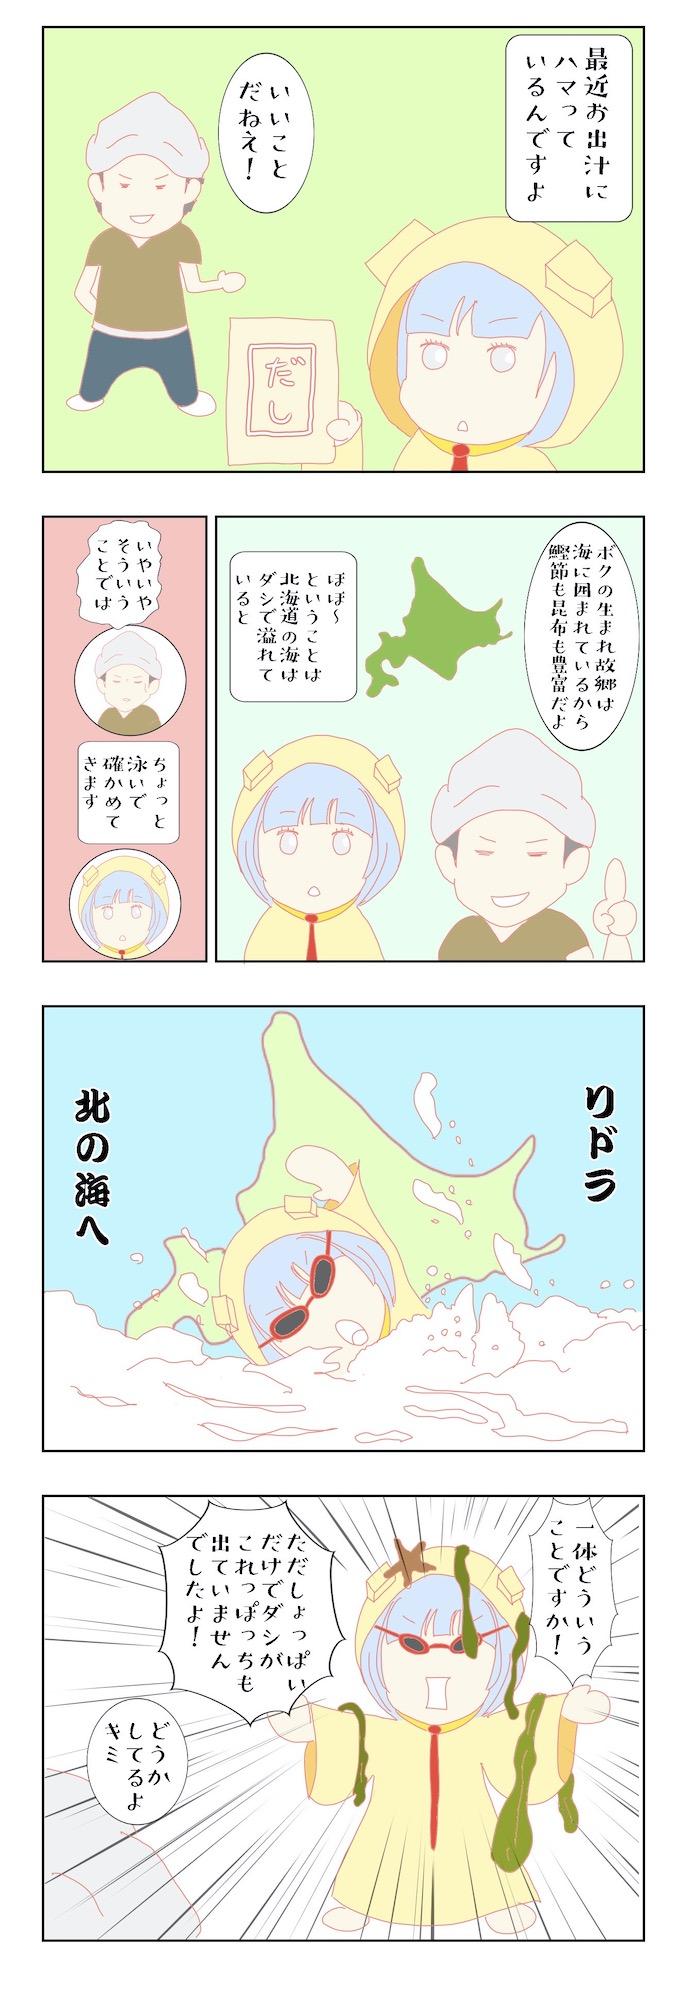 kimura_2003_01